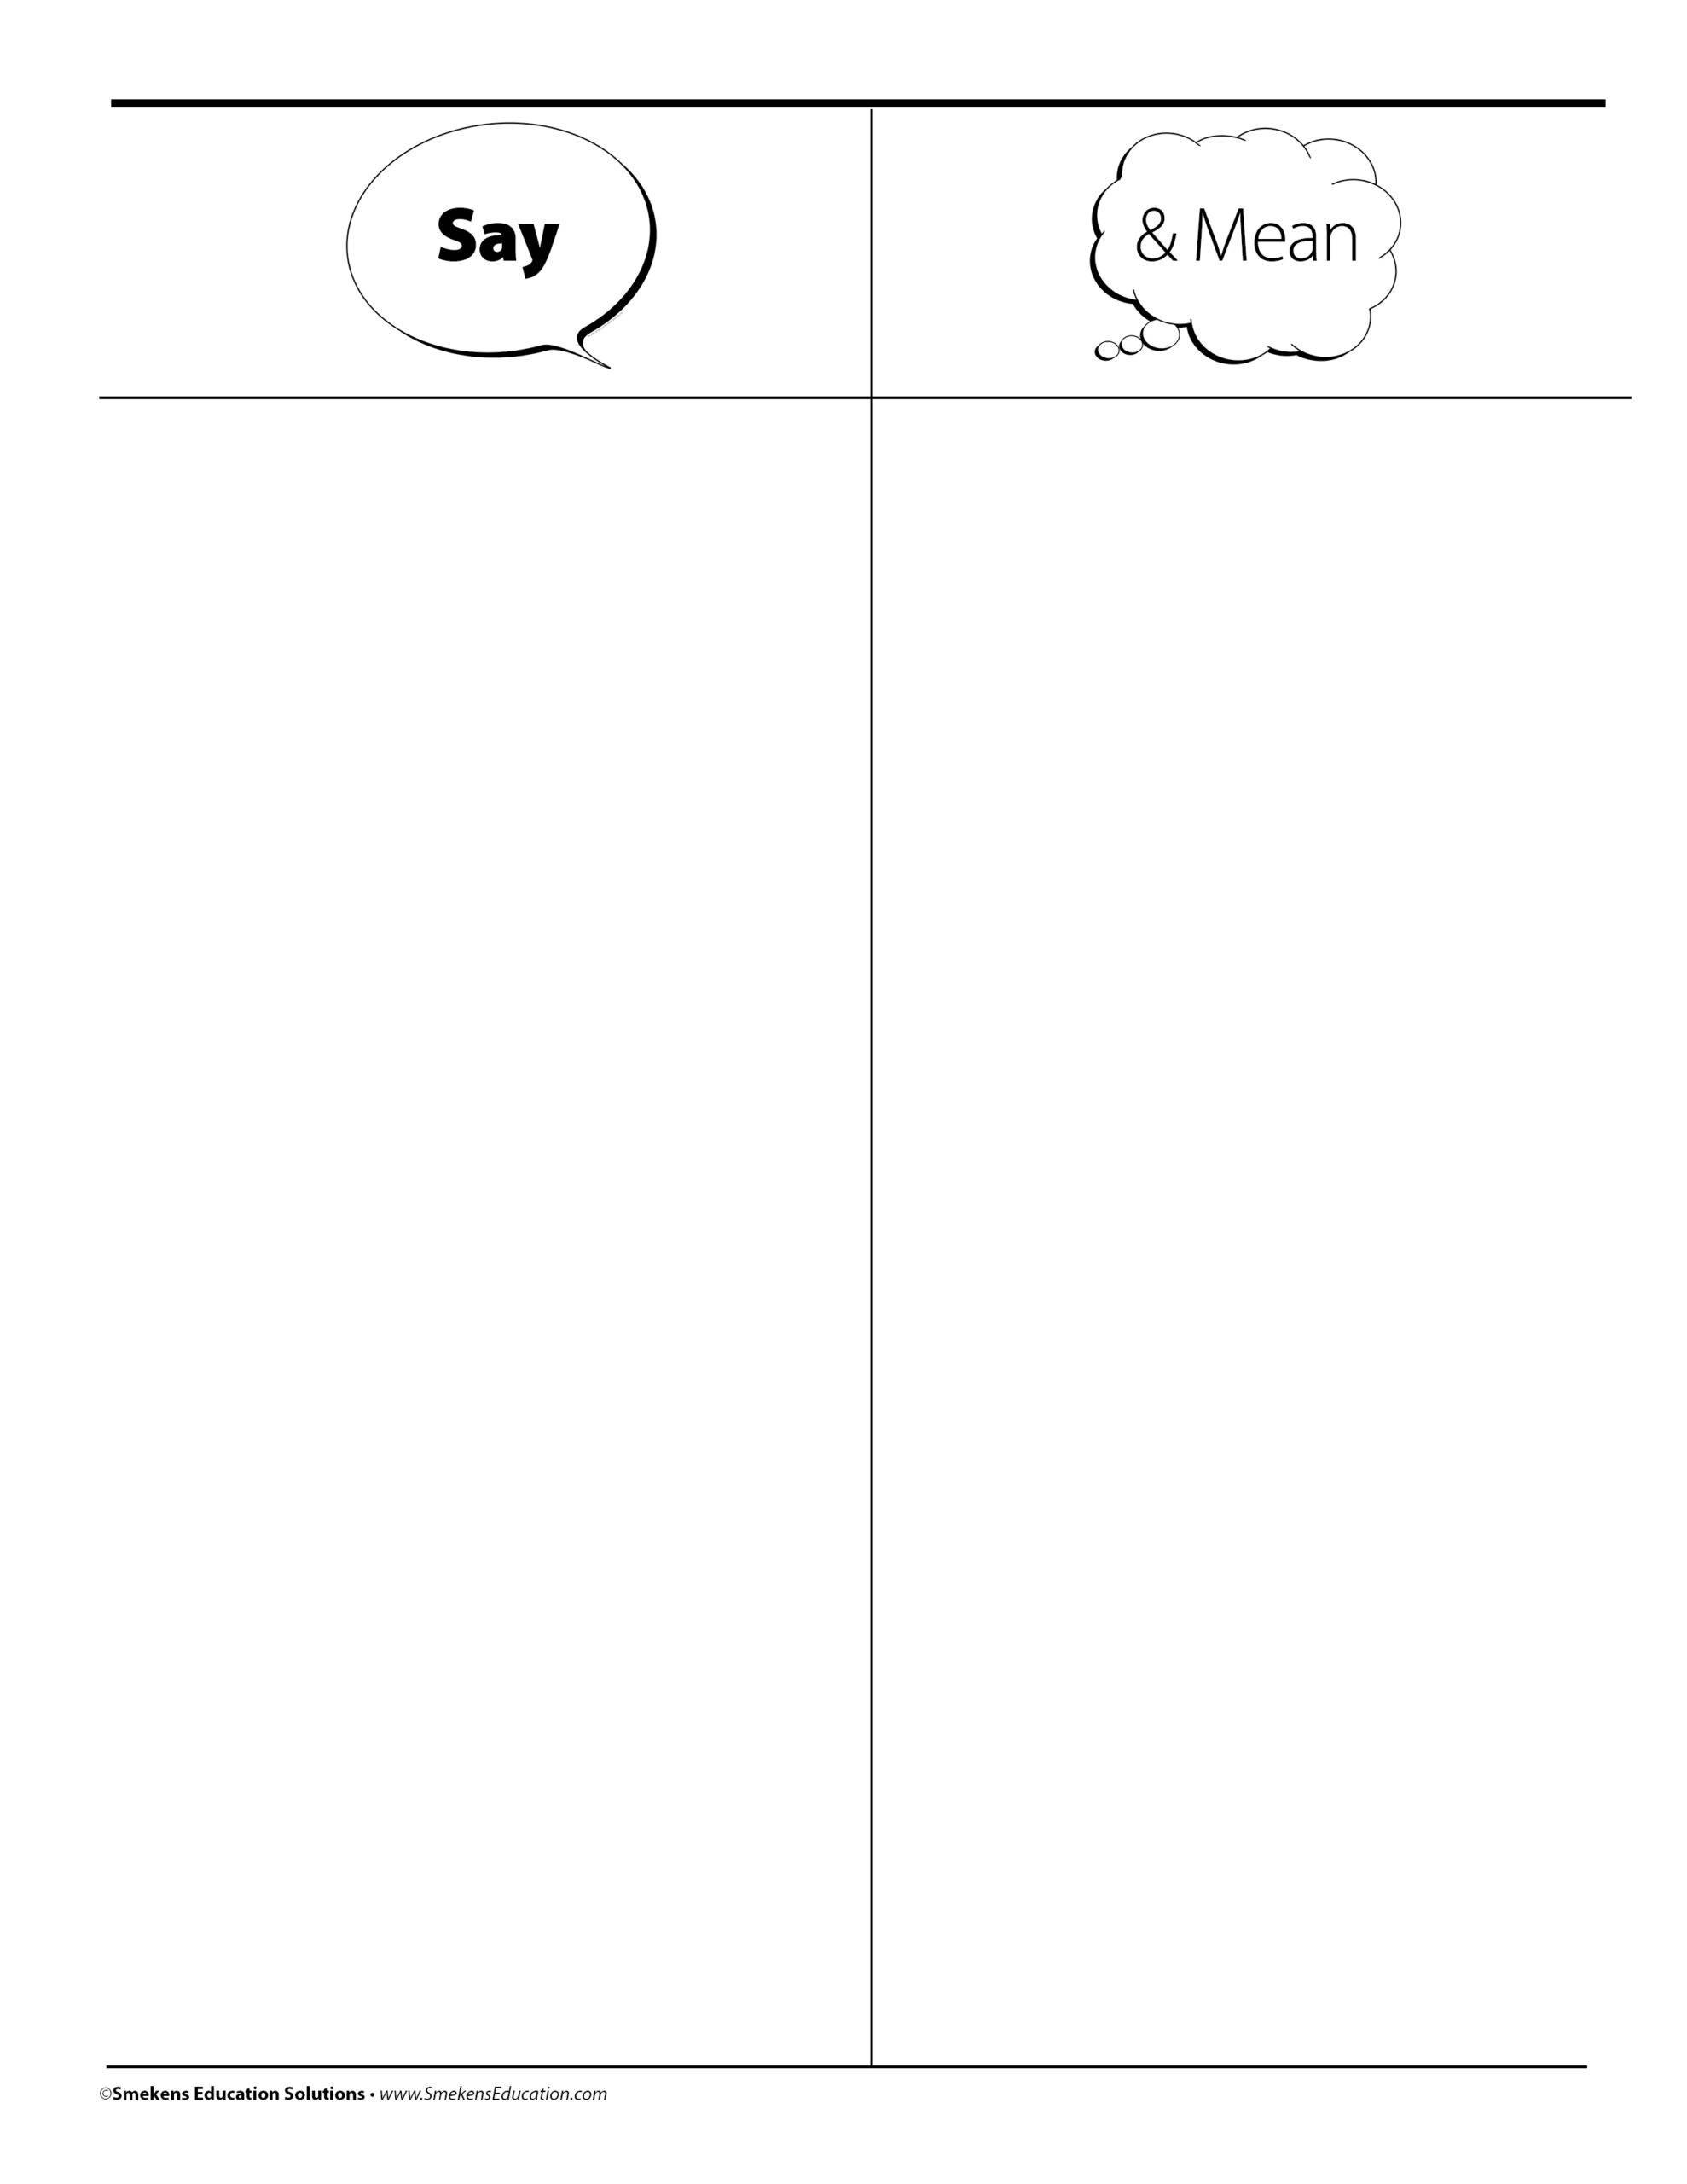 Say & Mean Organizer Sheet